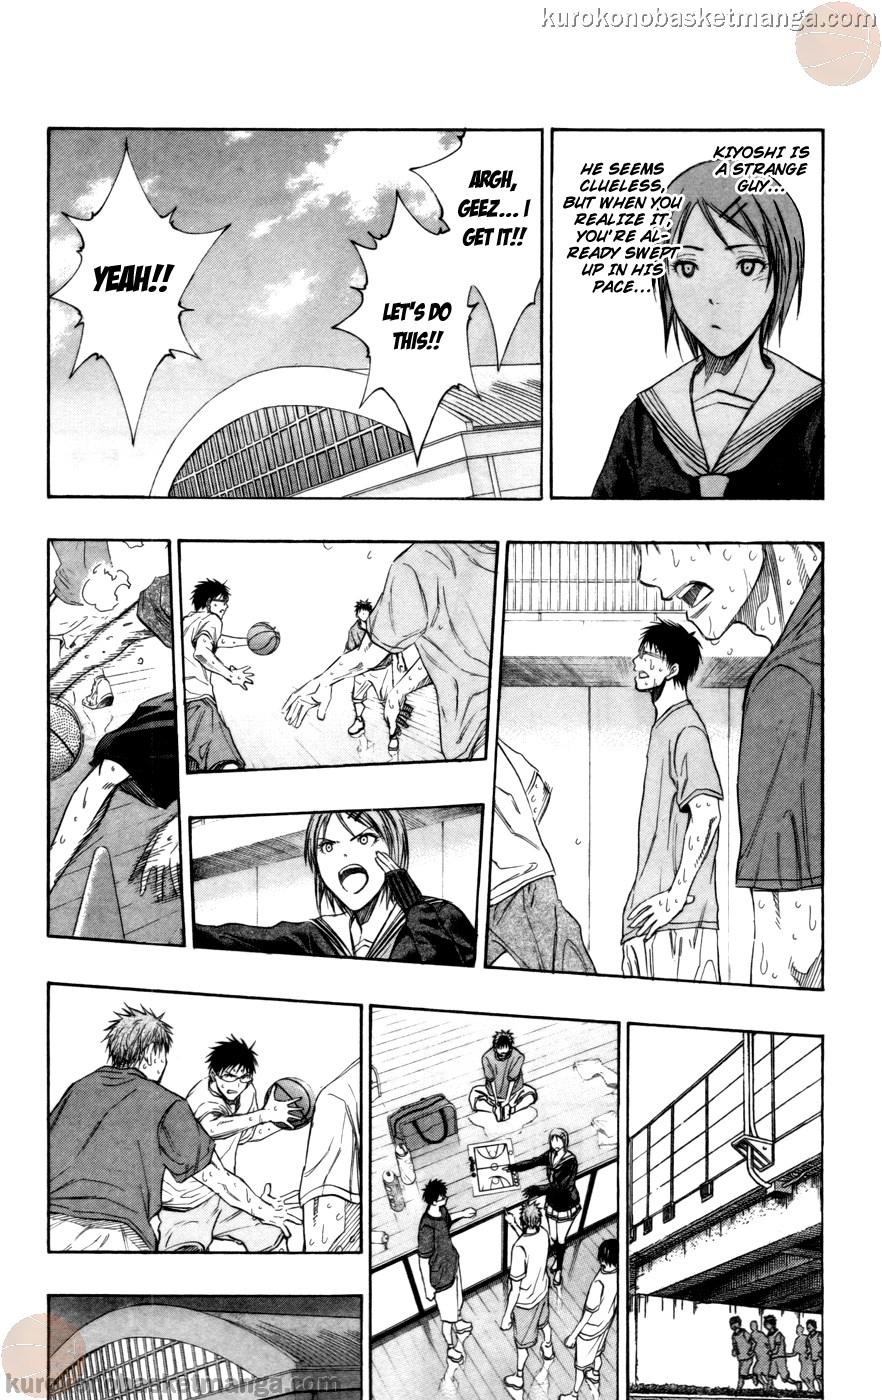 Kuroko no Basket Manga Chapter 97 - Image 14